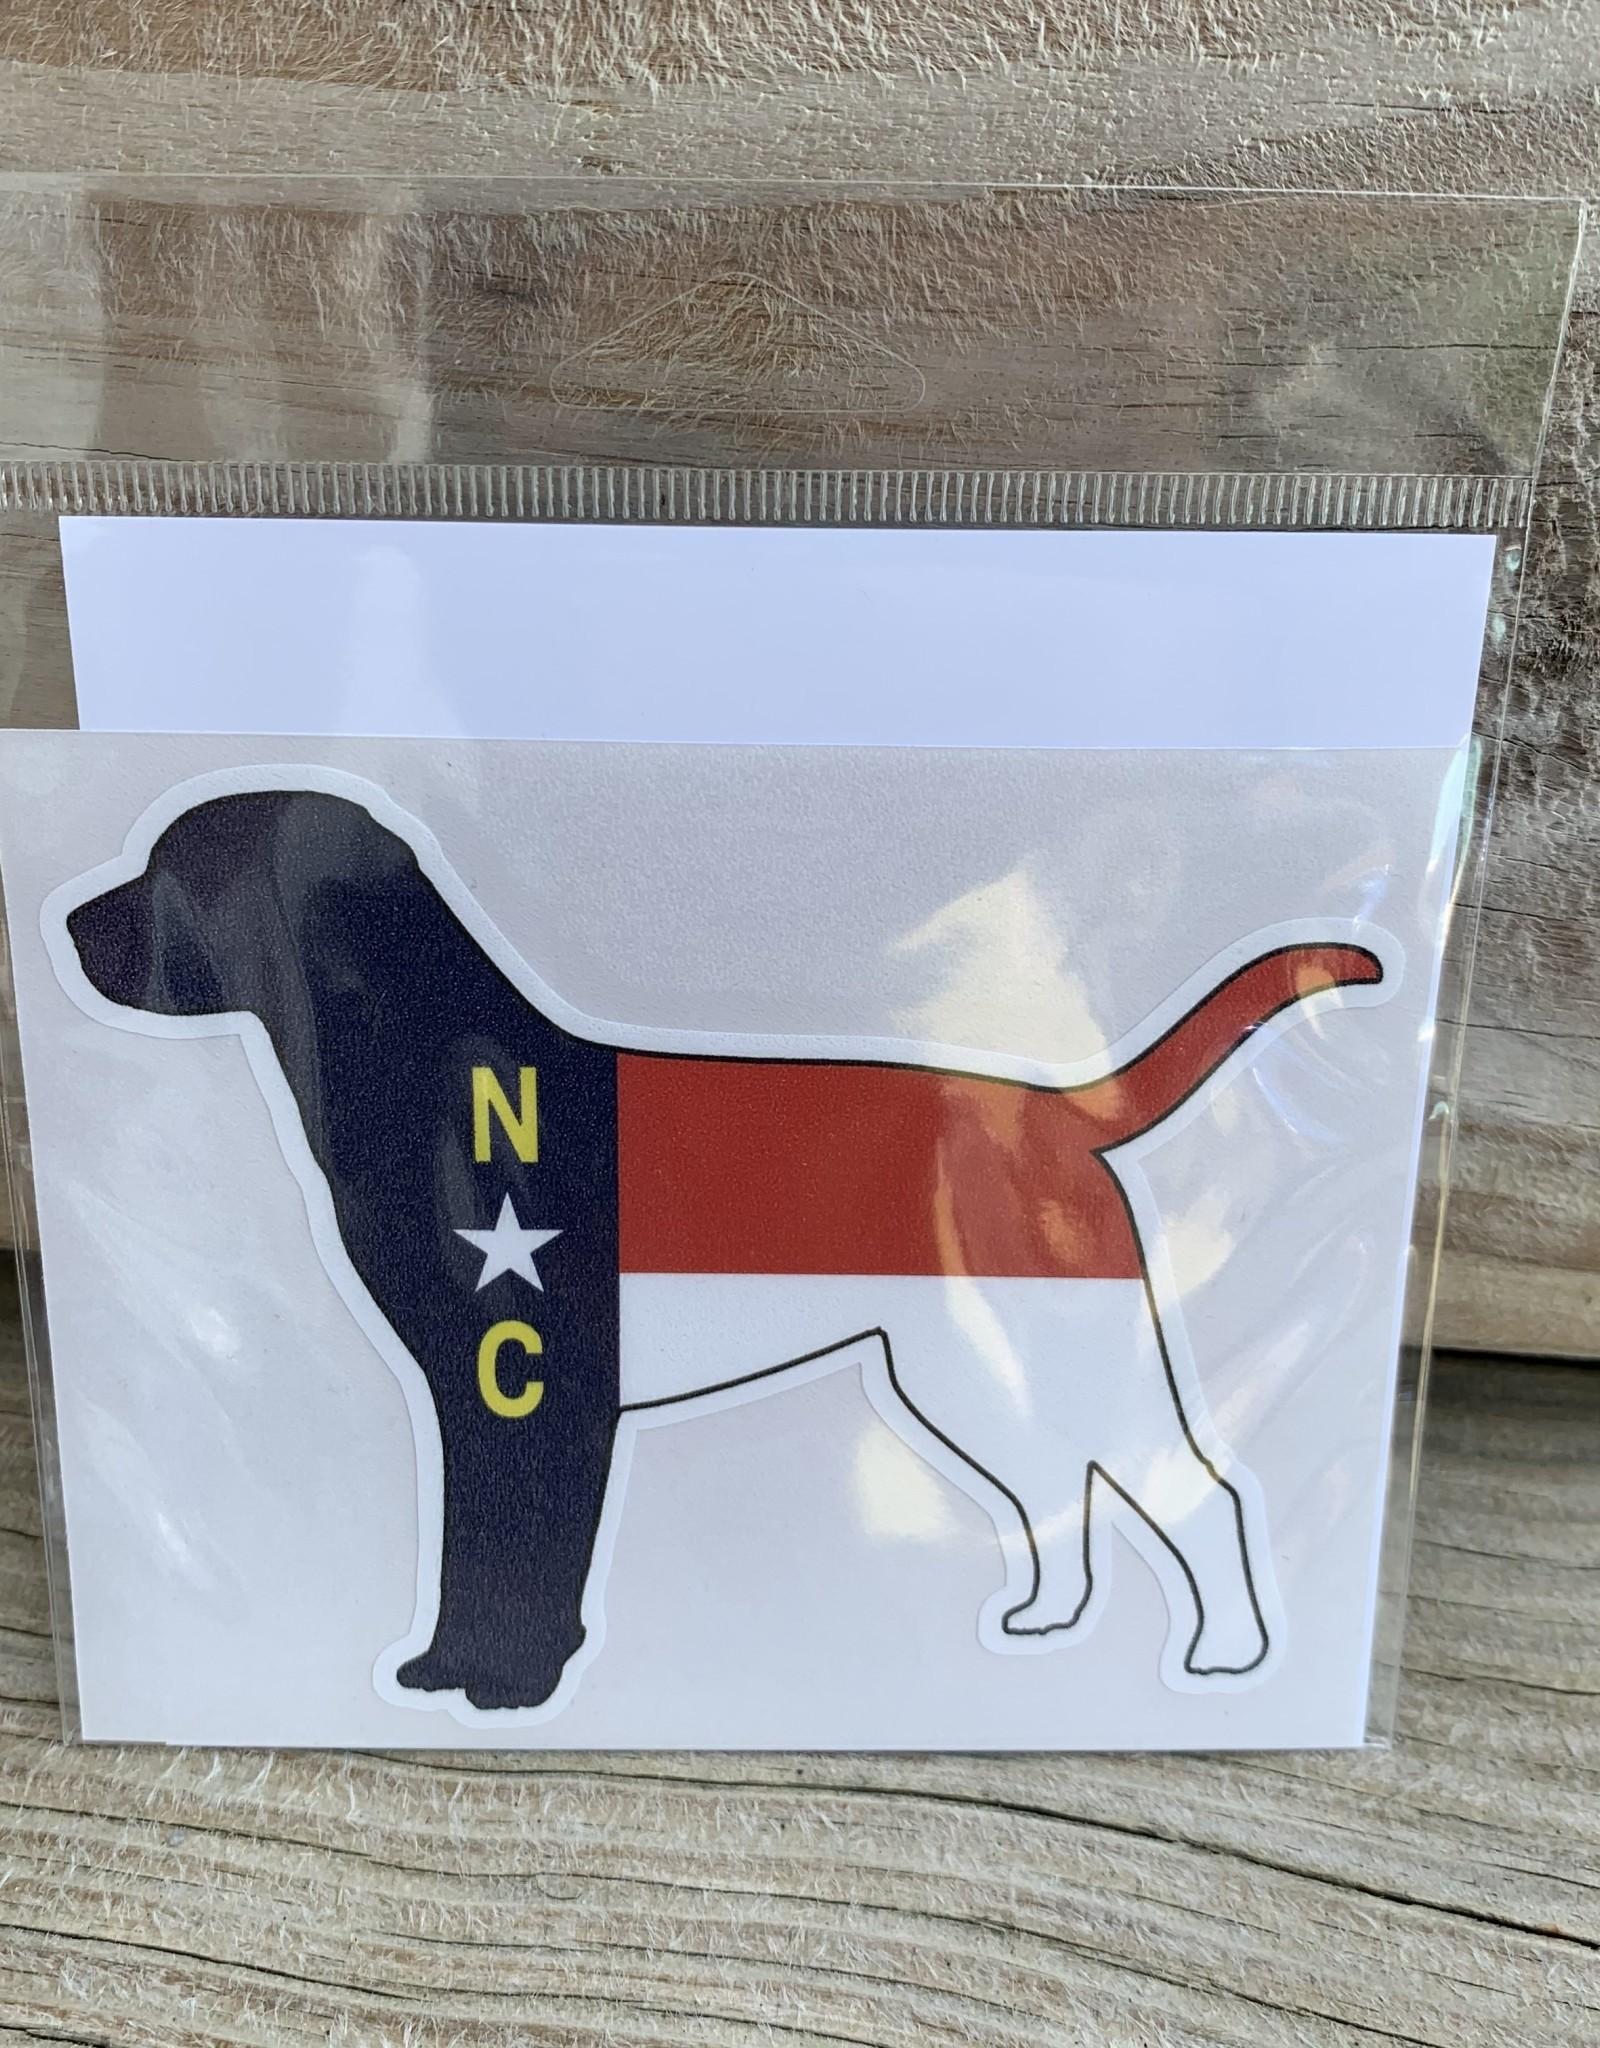 NC DOG STICKER (LARGE)